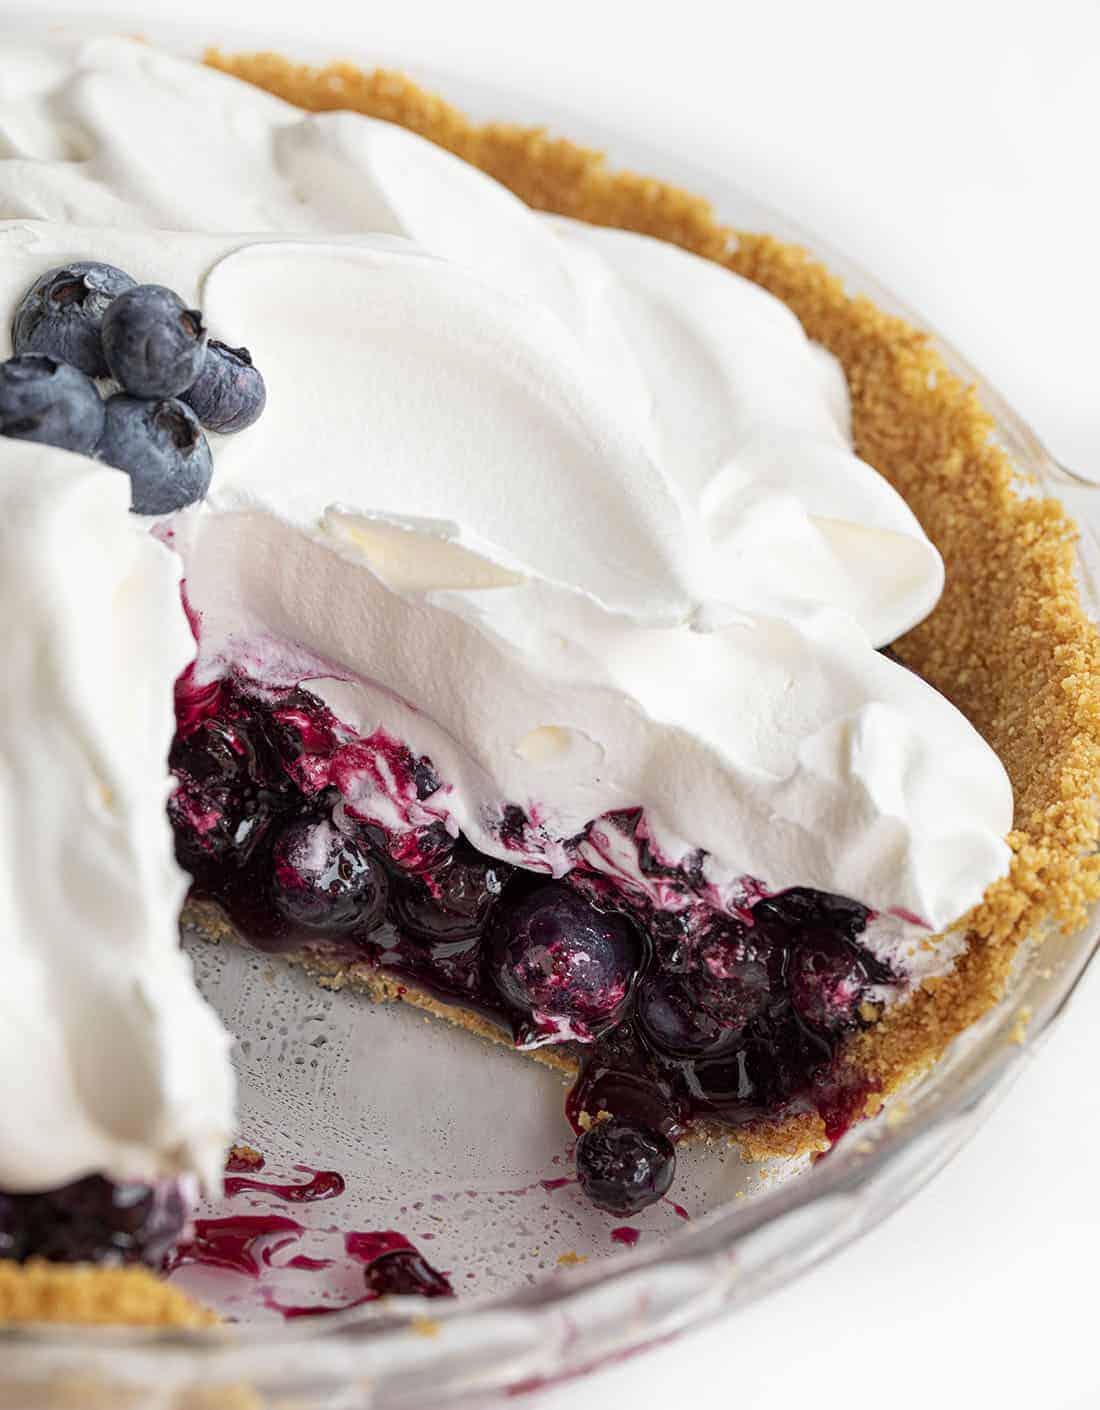 Cut Into Blueberry Pie